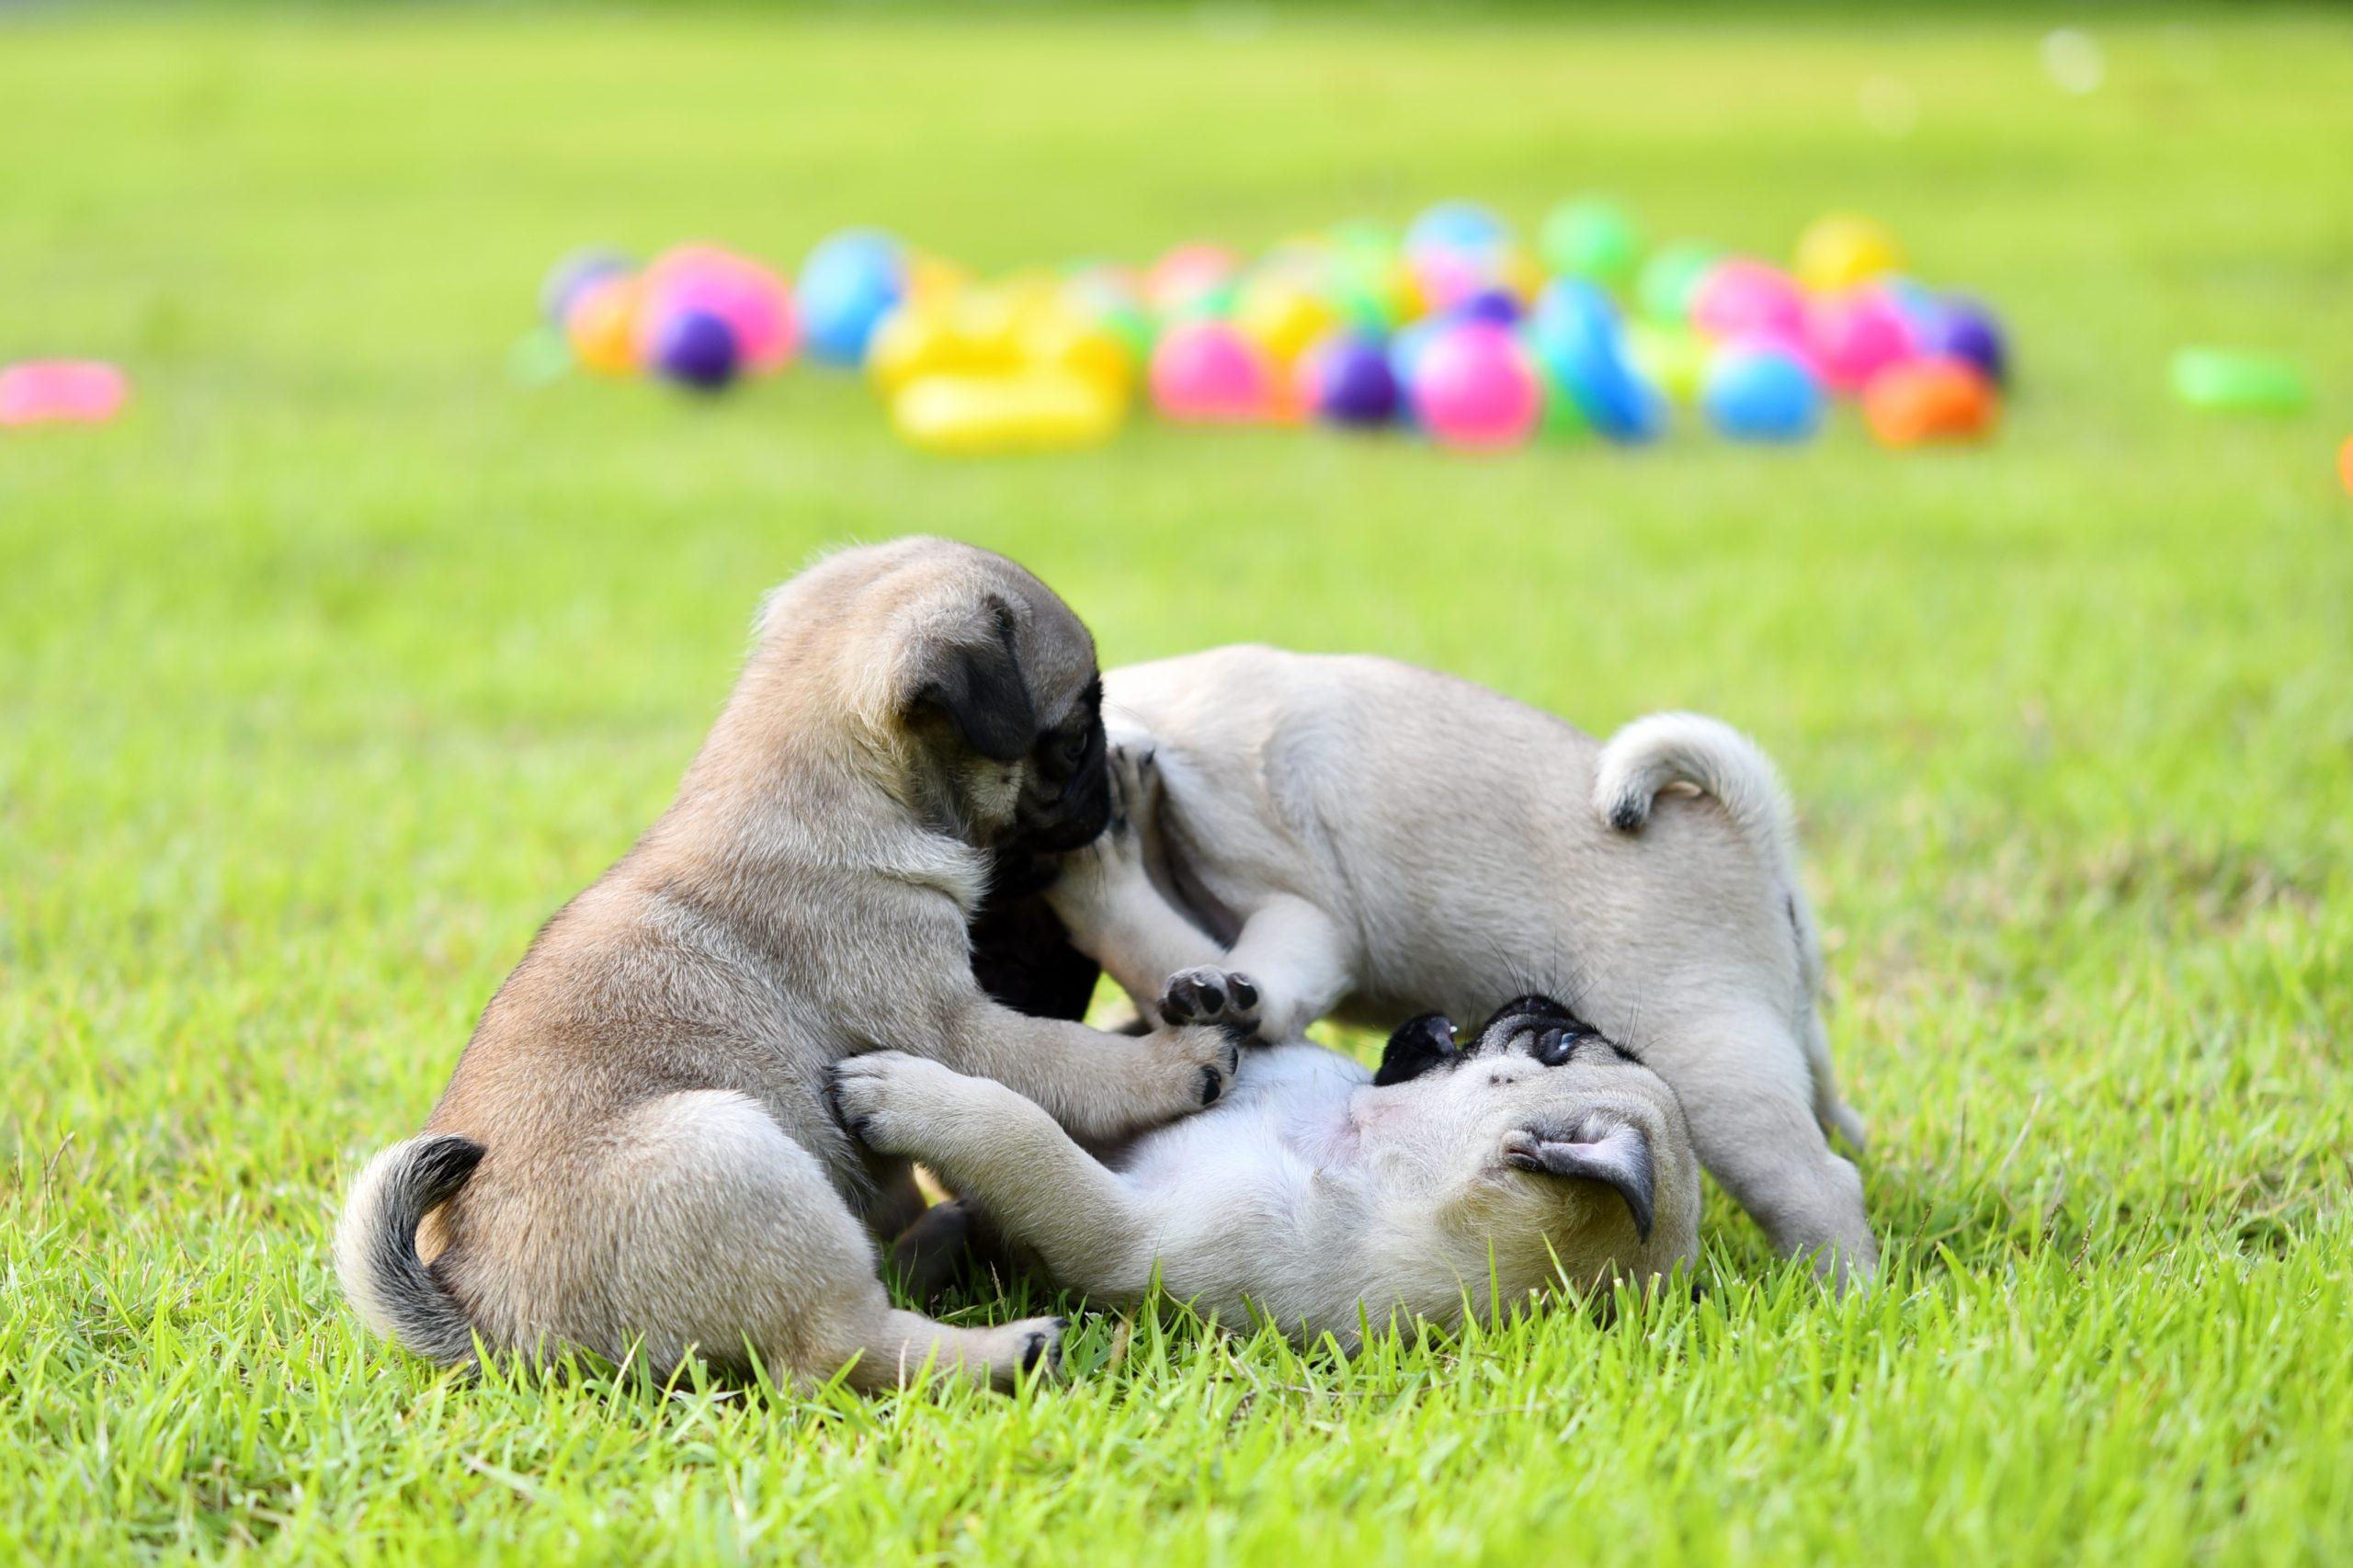 Puppy balls scaled